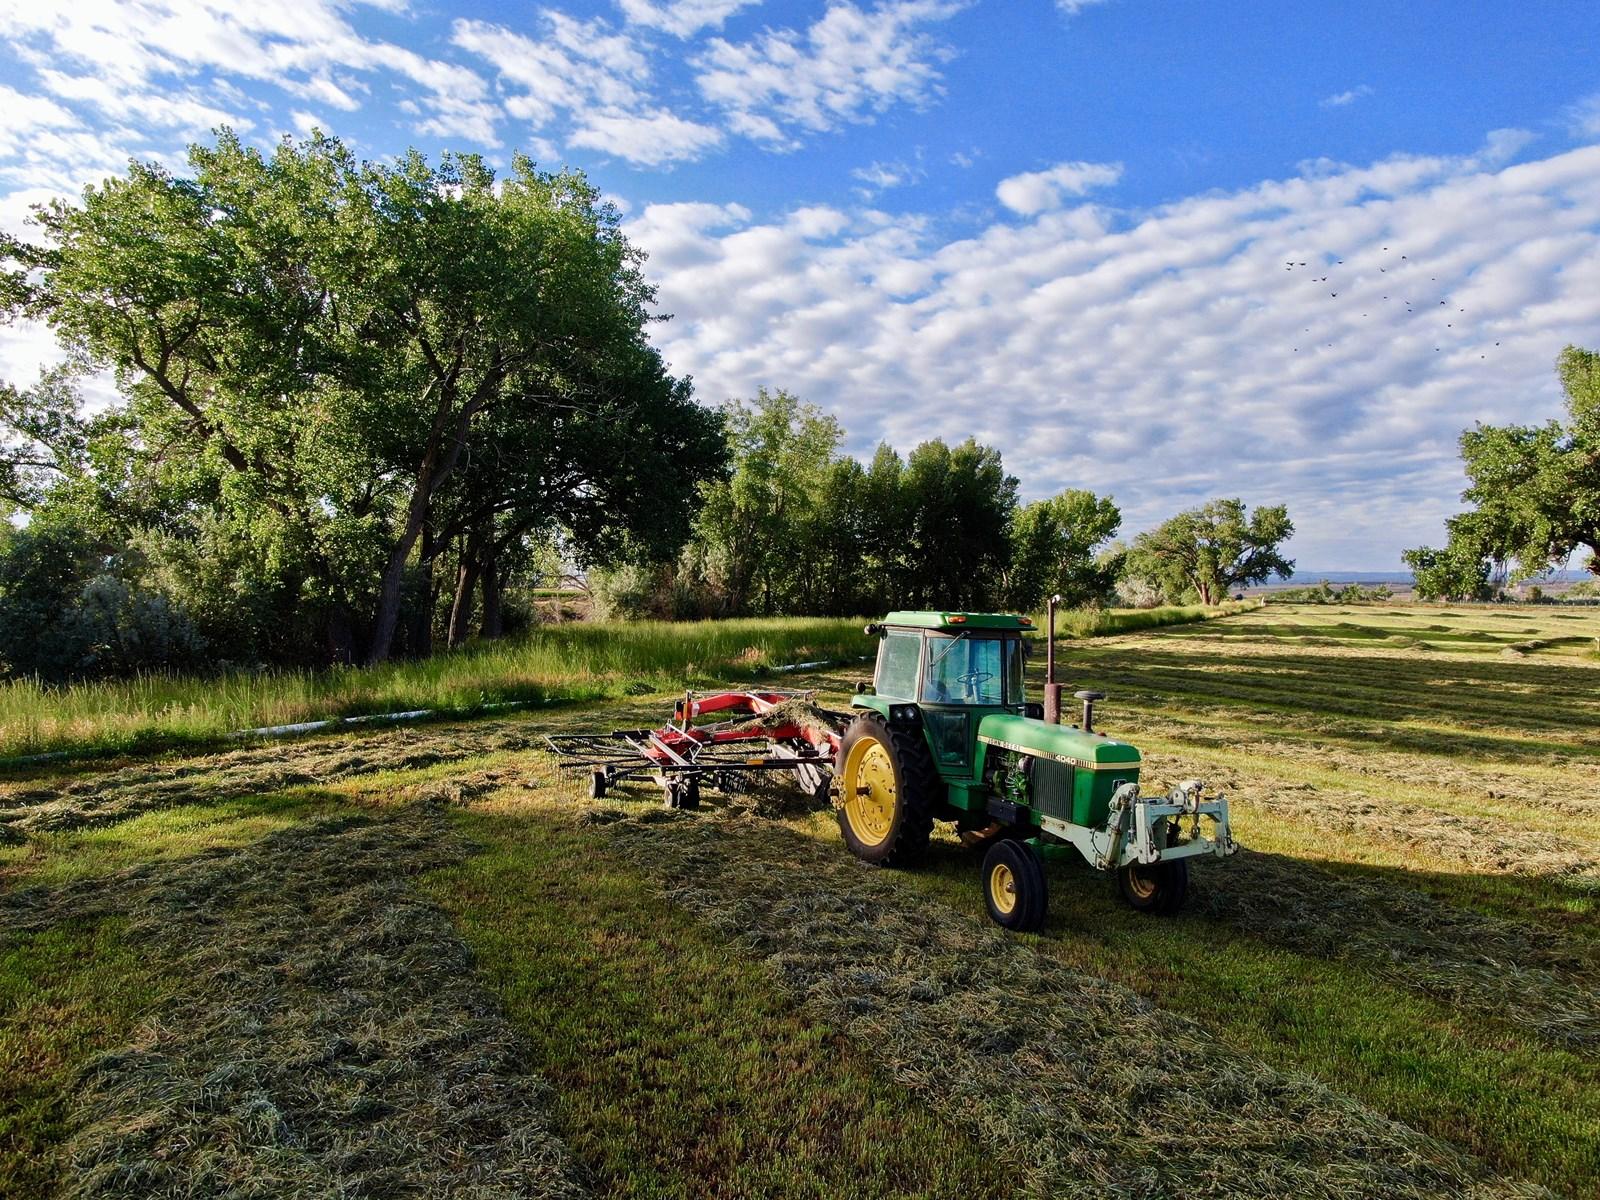 olathe hay ranch for sale